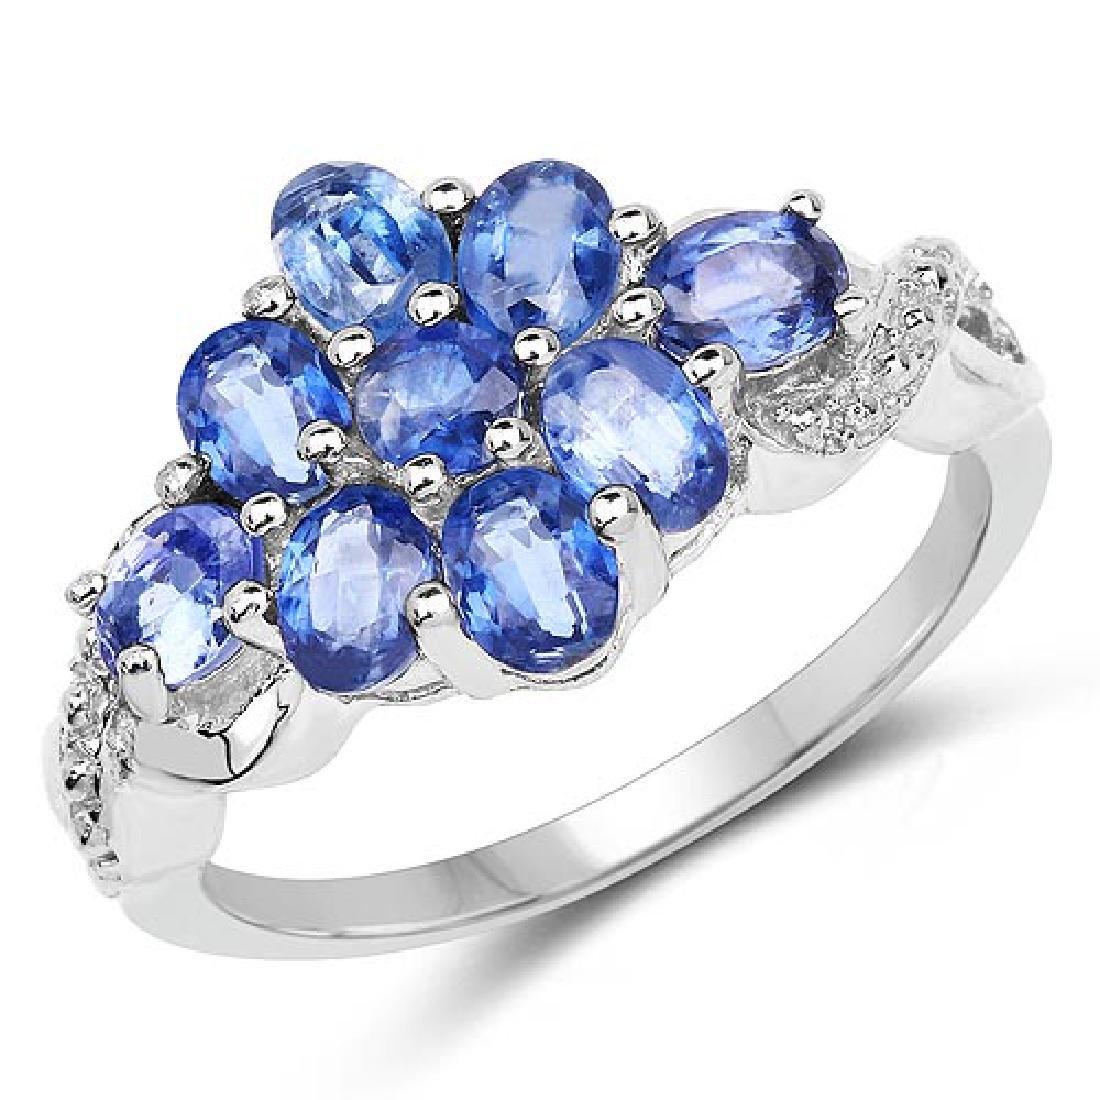 2.30 Carat Genuine Kyanite .925 Sterling Silver Ring